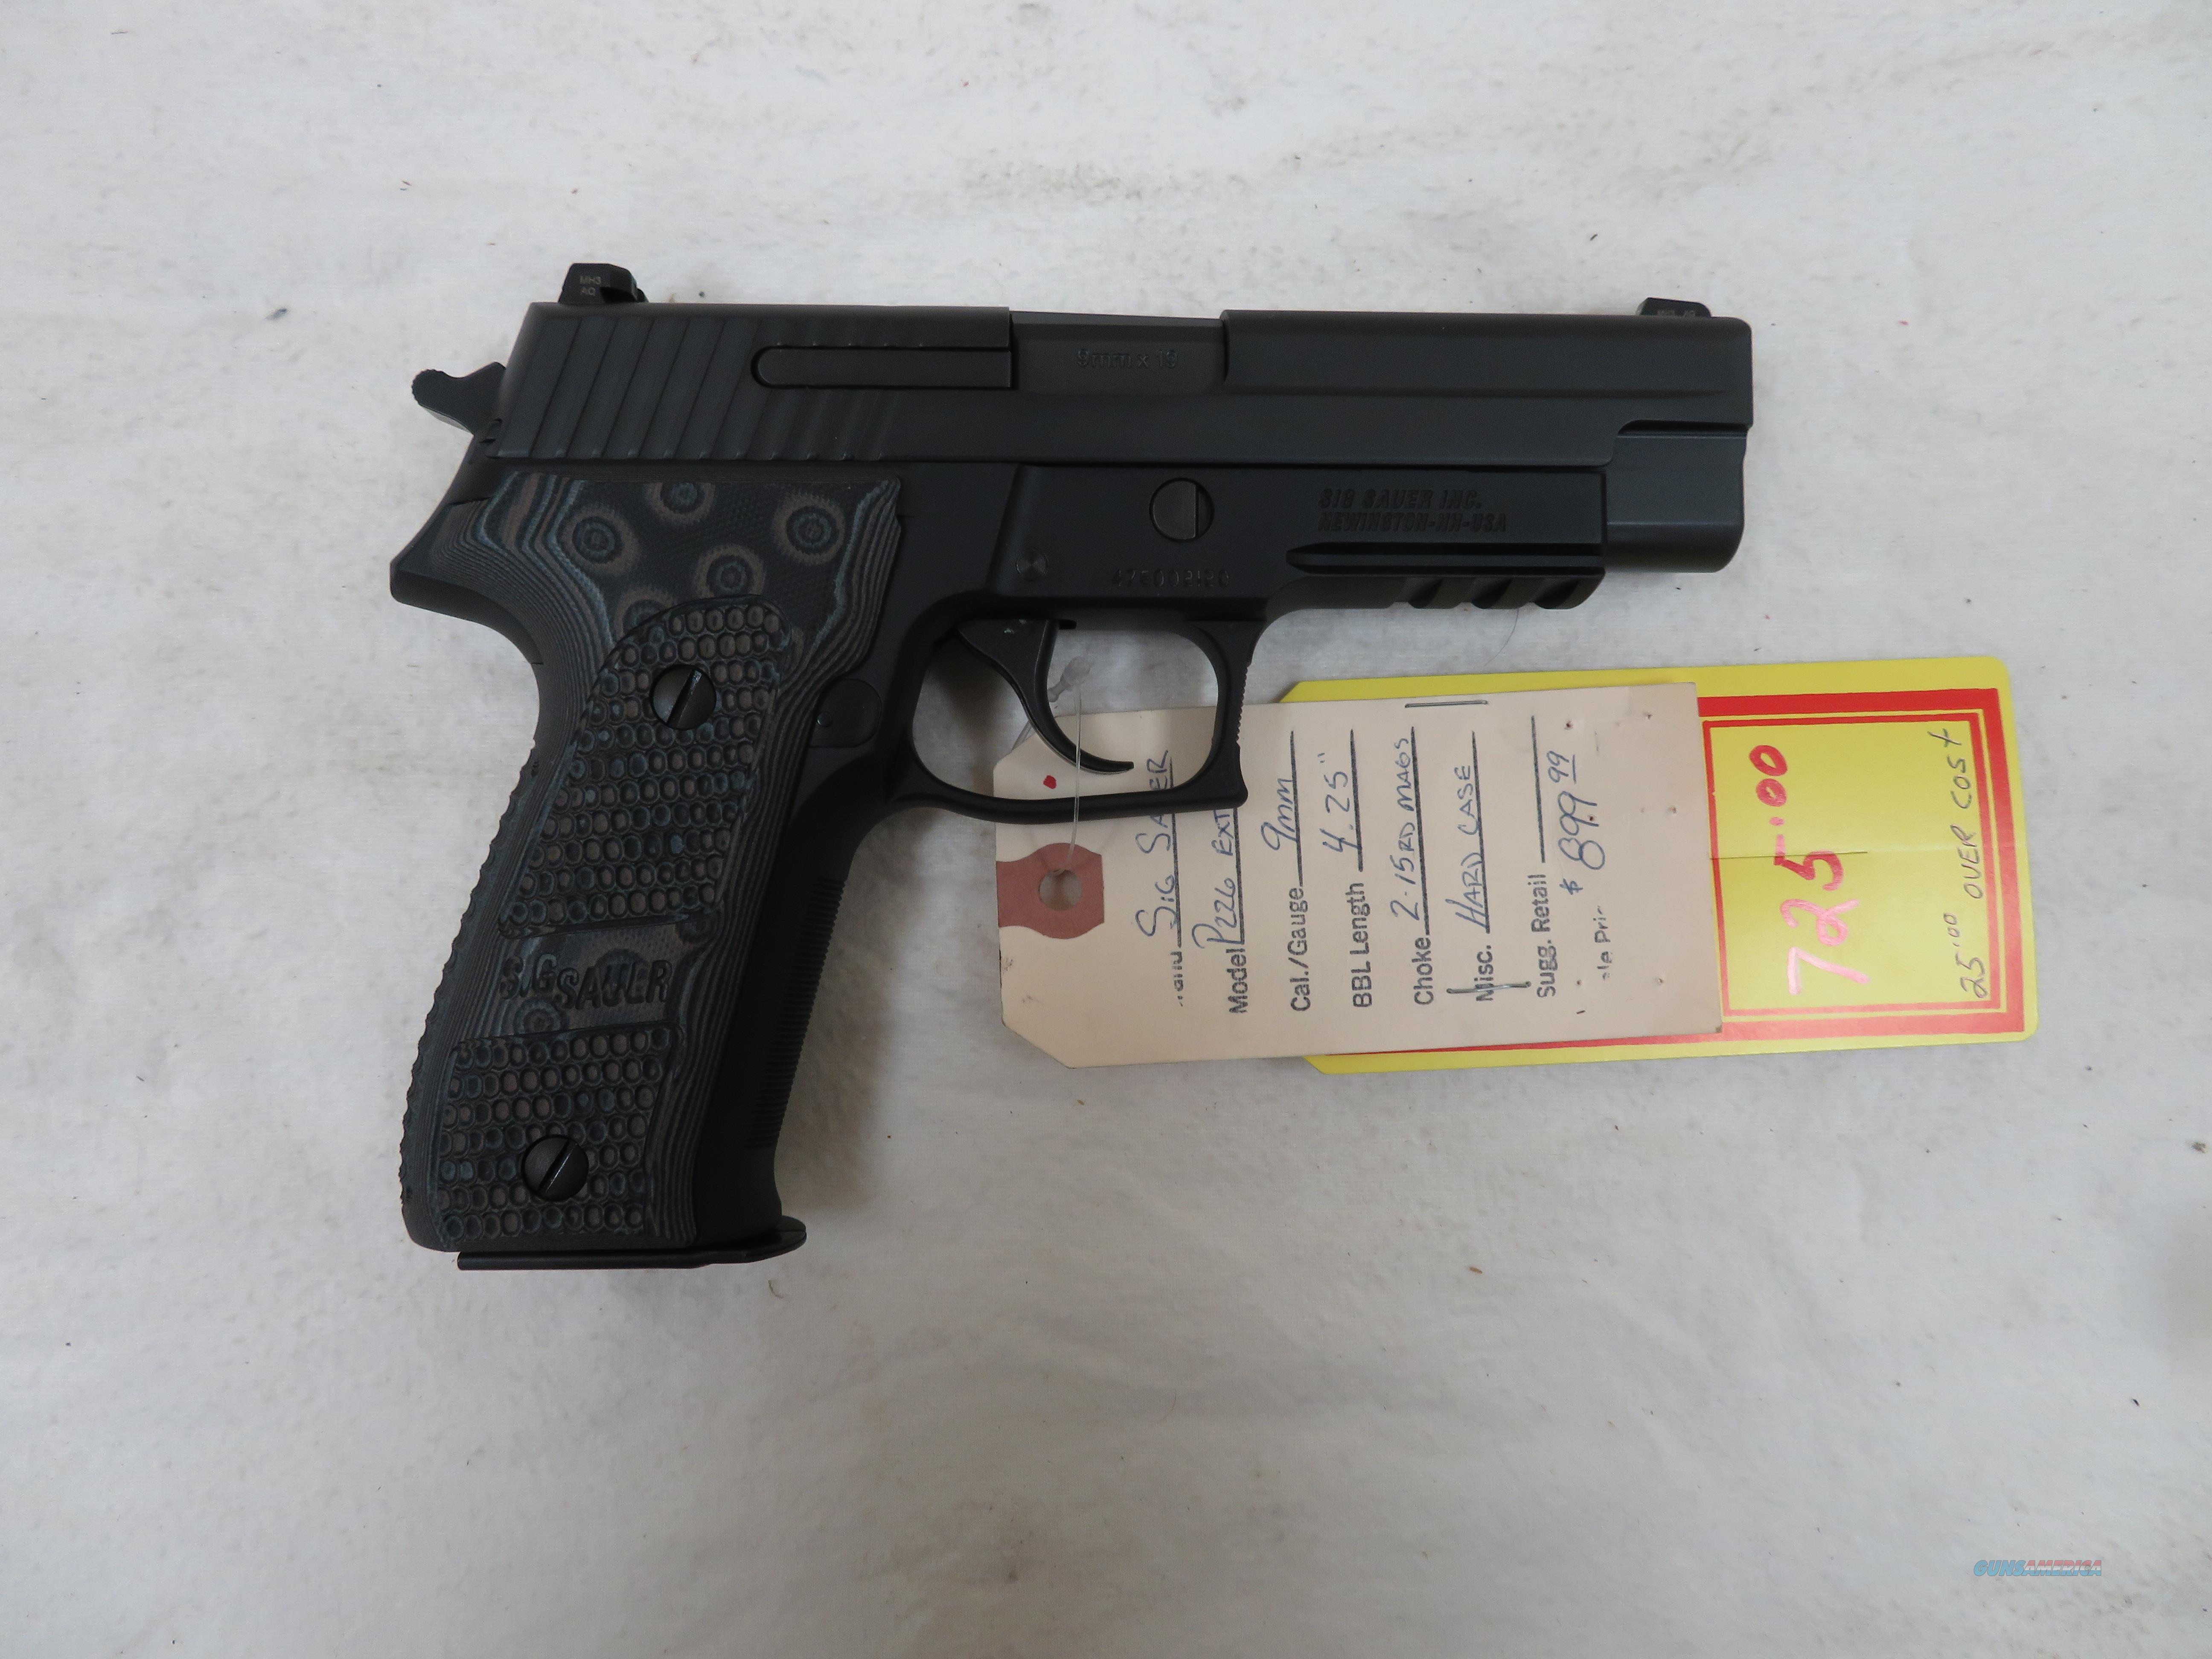 "SIG SAUER P226 EXTREME 9MM 4.4""  Guns > Pistols > Sig - Sauer/Sigarms Pistols > P226"